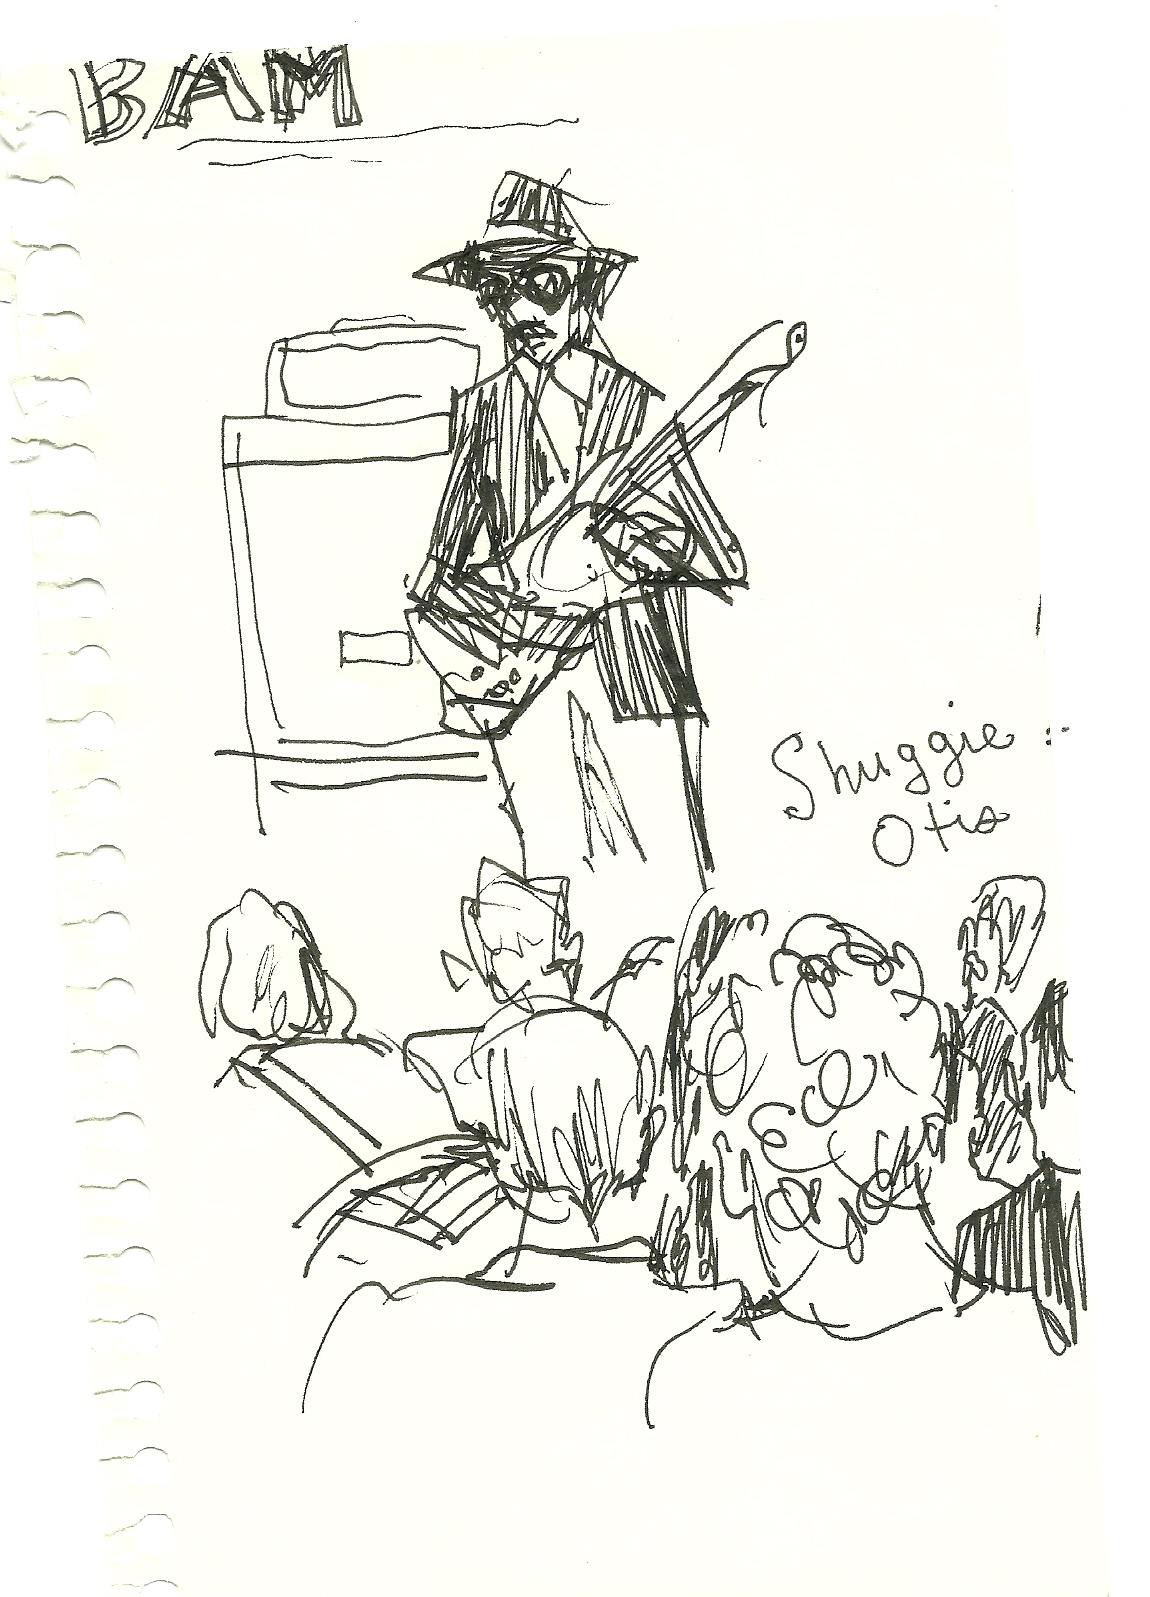 shuggie sketch